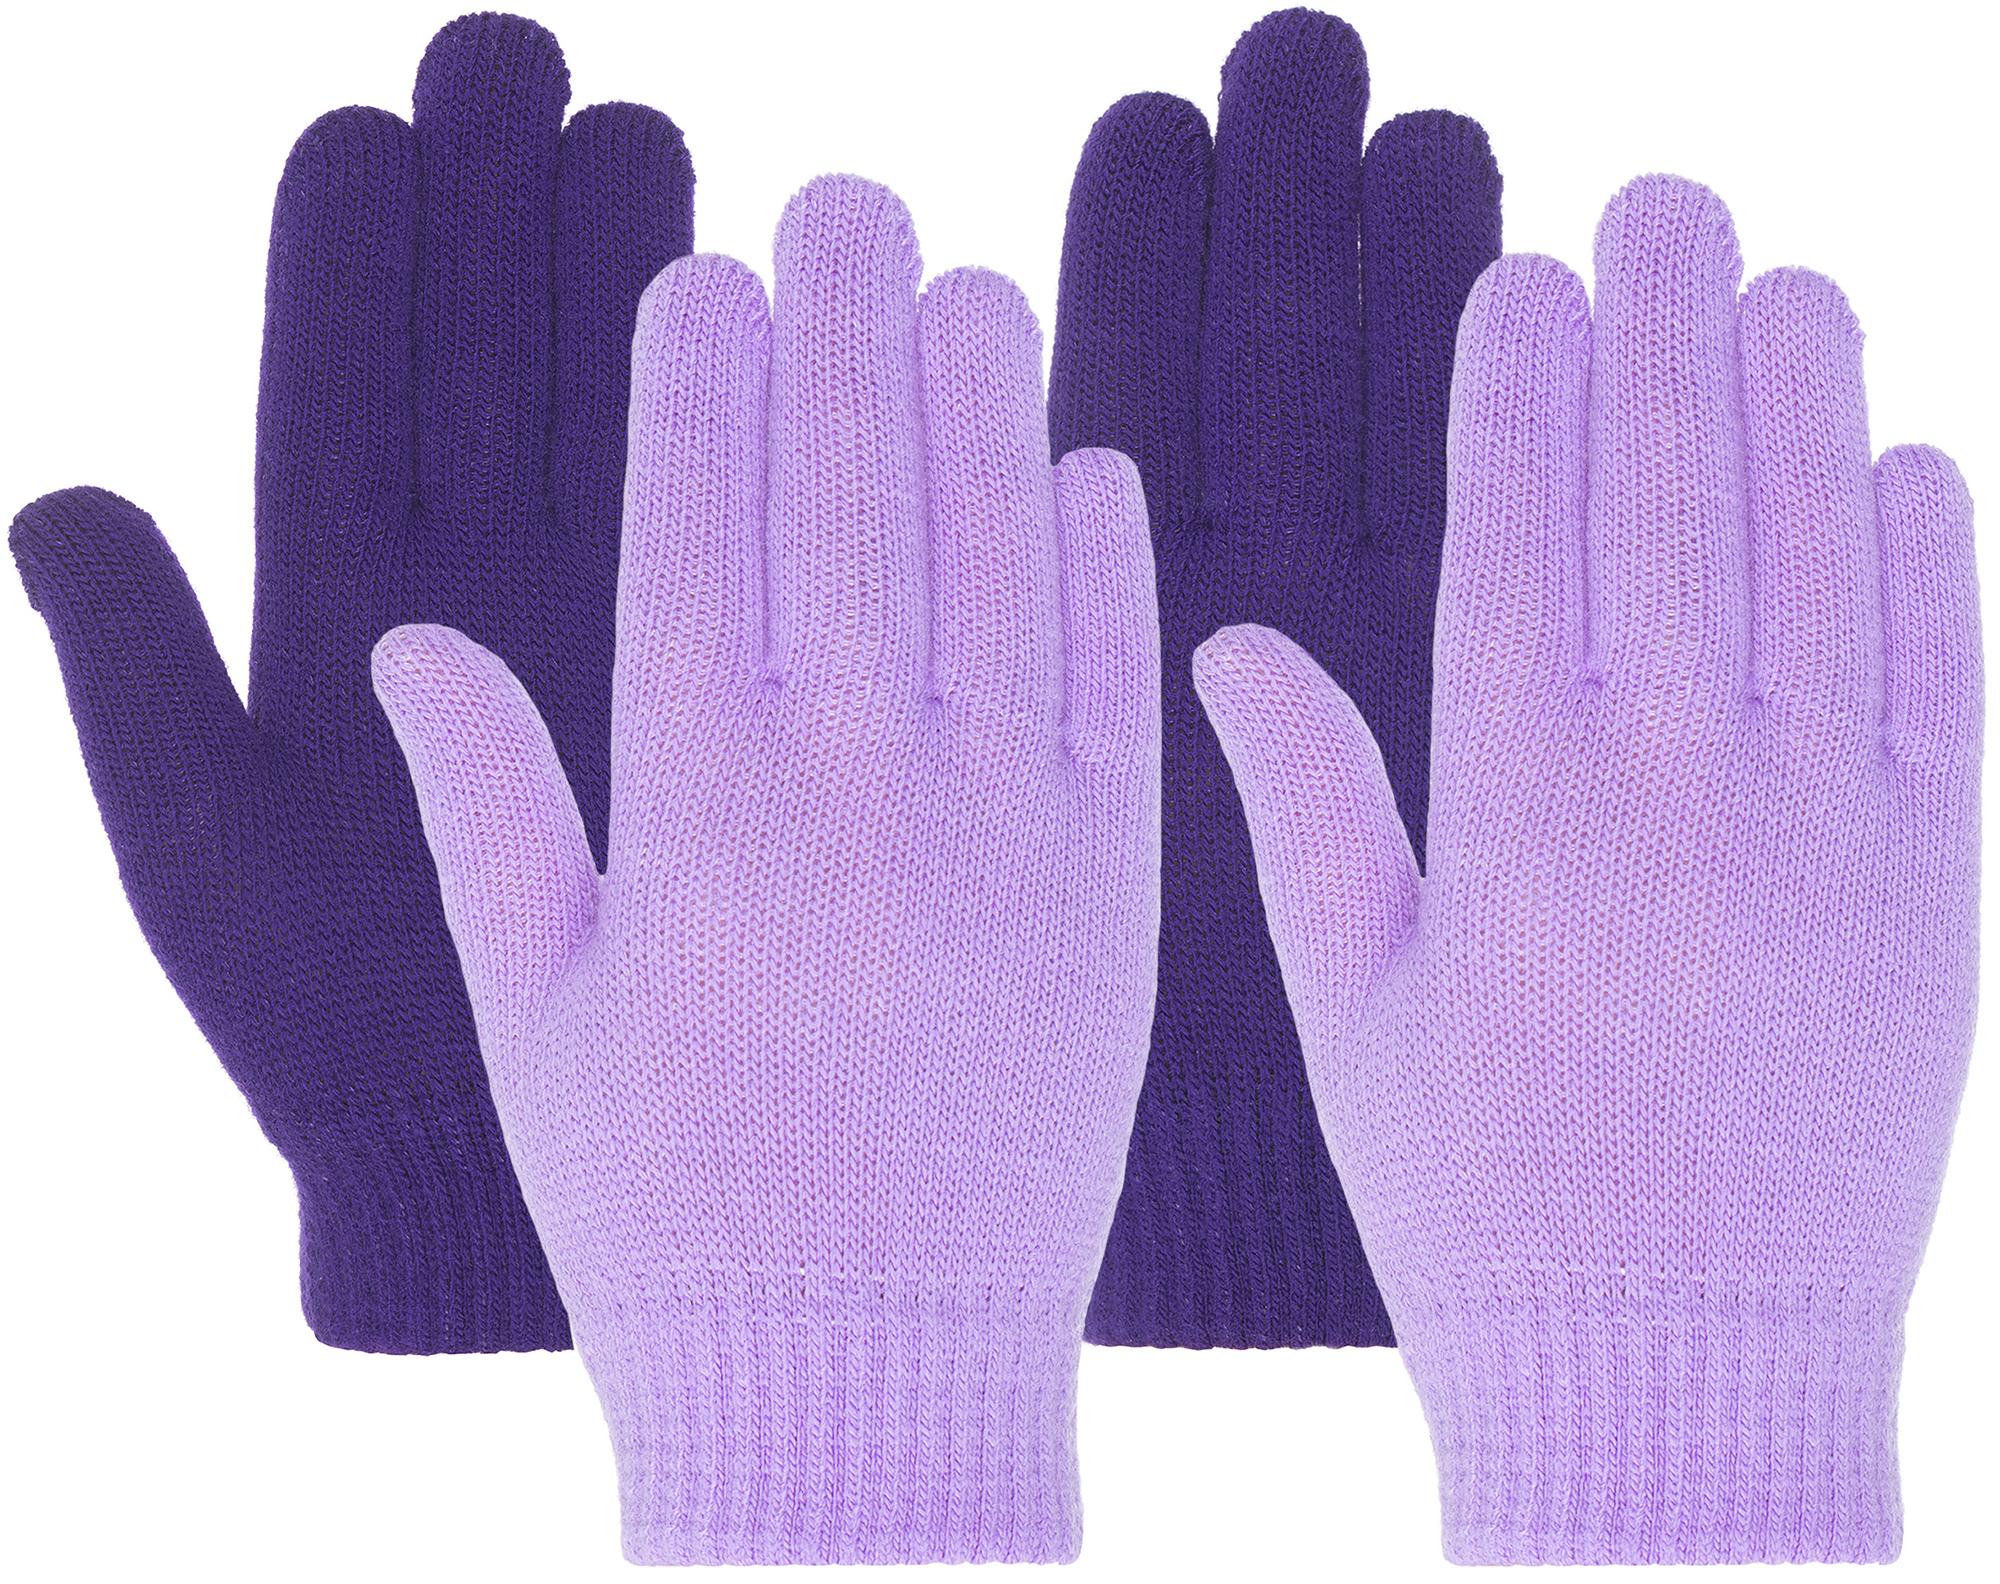 IcePeak Перчатки для девочек IcePeak, размер Без размера icepeak шапка для девочек icepeak размер без размера